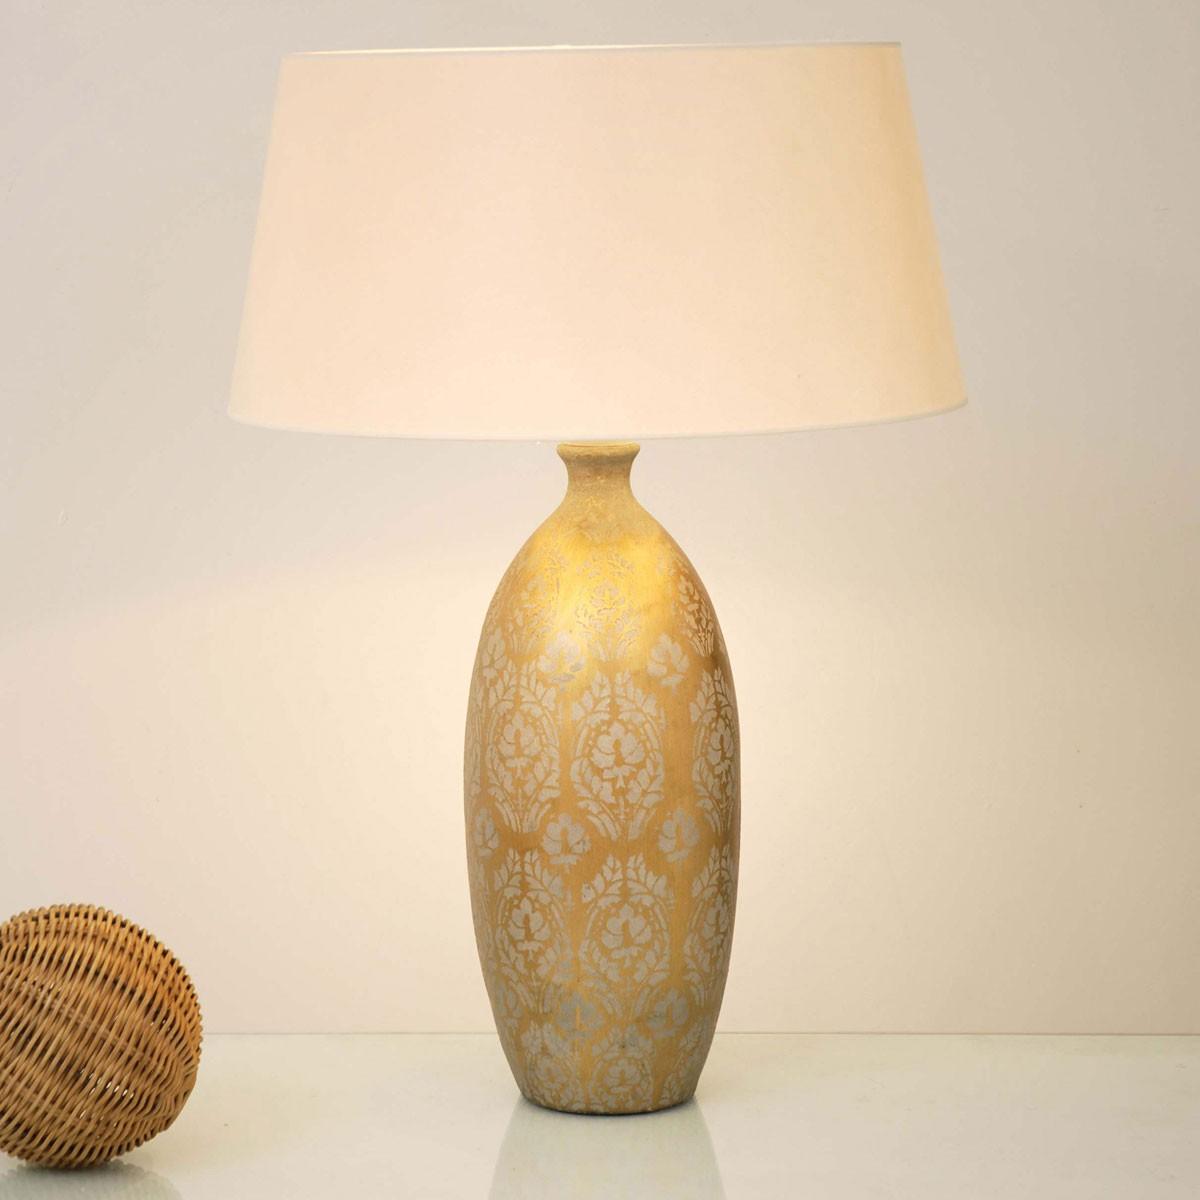 holl nder 432 k 1210 tischleuchte vaso barocco keramik. Black Bedroom Furniture Sets. Home Design Ideas